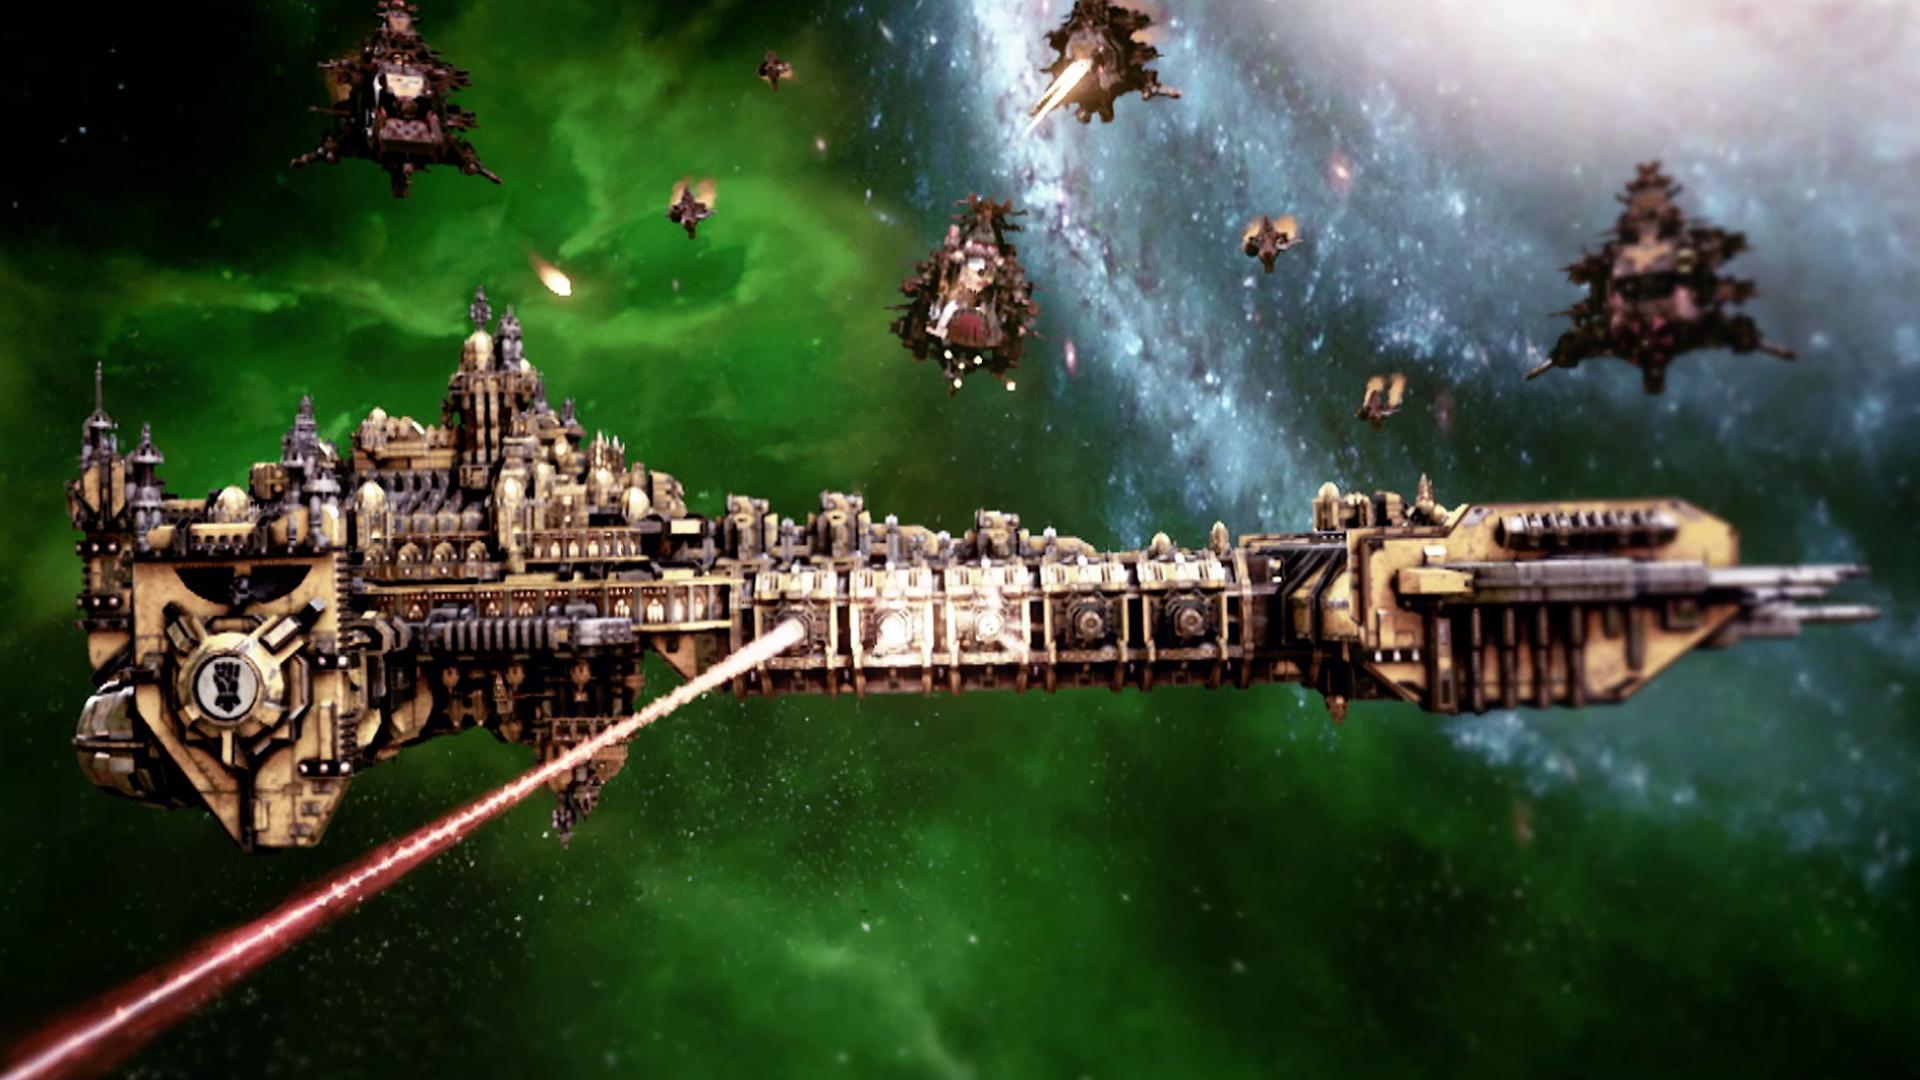 Battlefleet Gothic: Armada - Space Marines